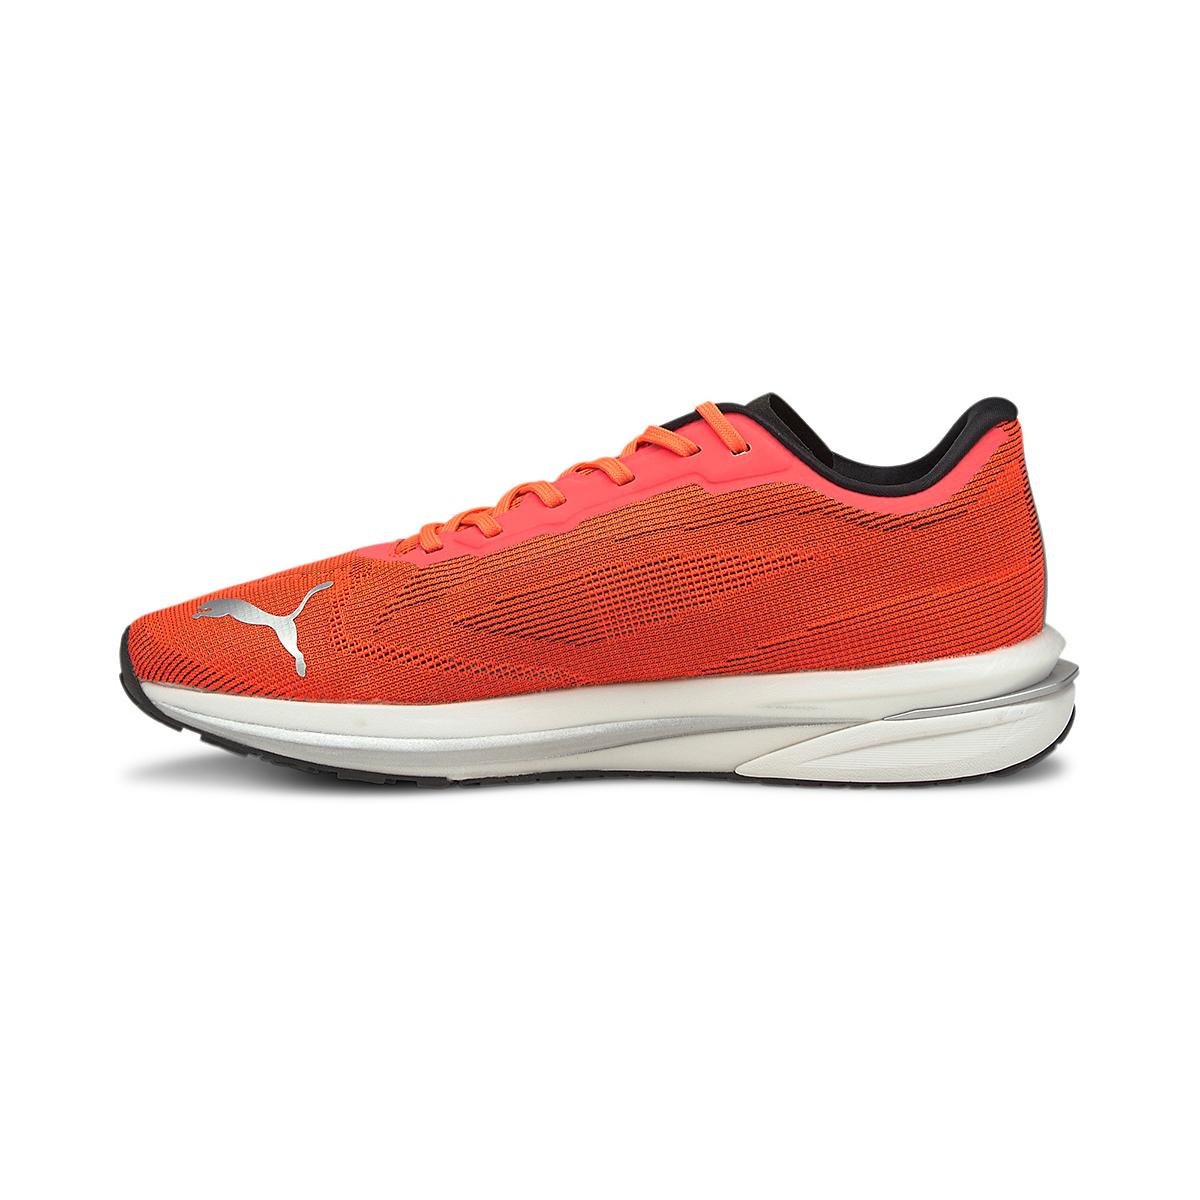 Women's Puma Velocity Nitro Running Shoe - Color: Lava Blast - Size: 5.5 - Width: Regular, Lava Blast, large, image 2